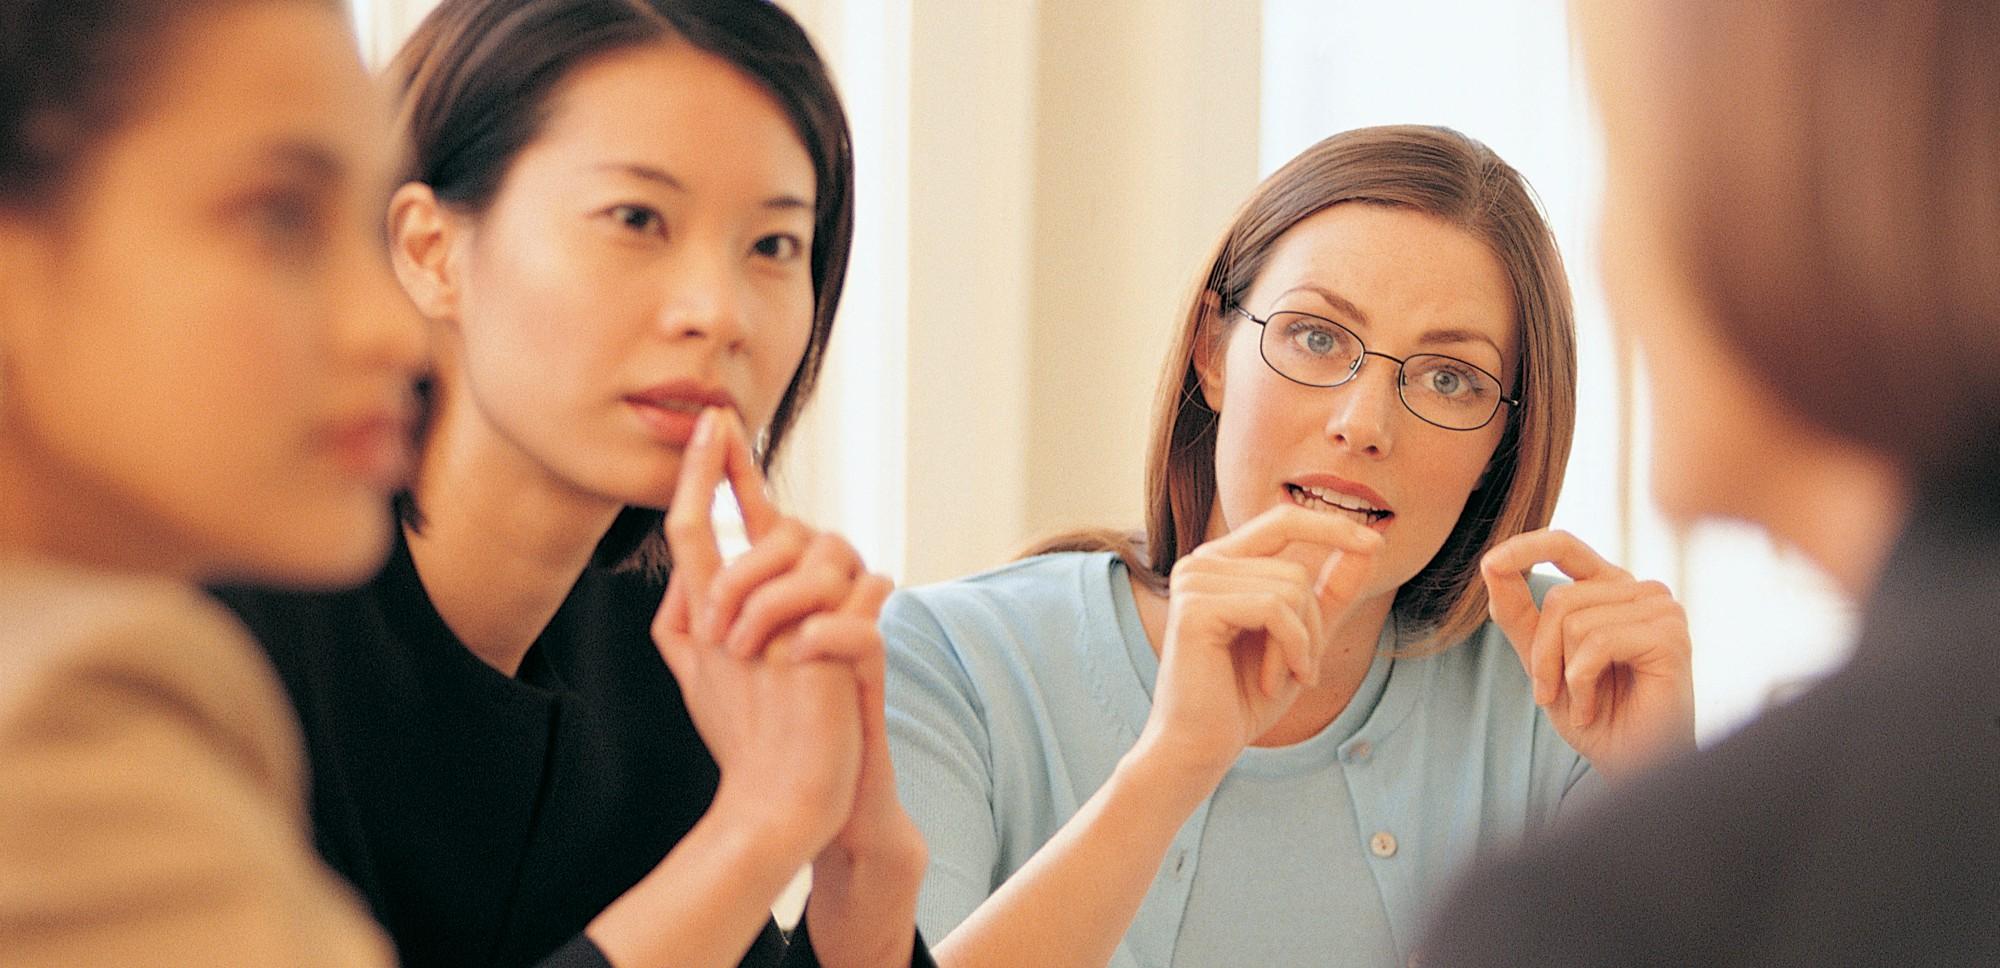 ACCIONA Employment Active Listening|ACCIONA Employment Benefits active listening